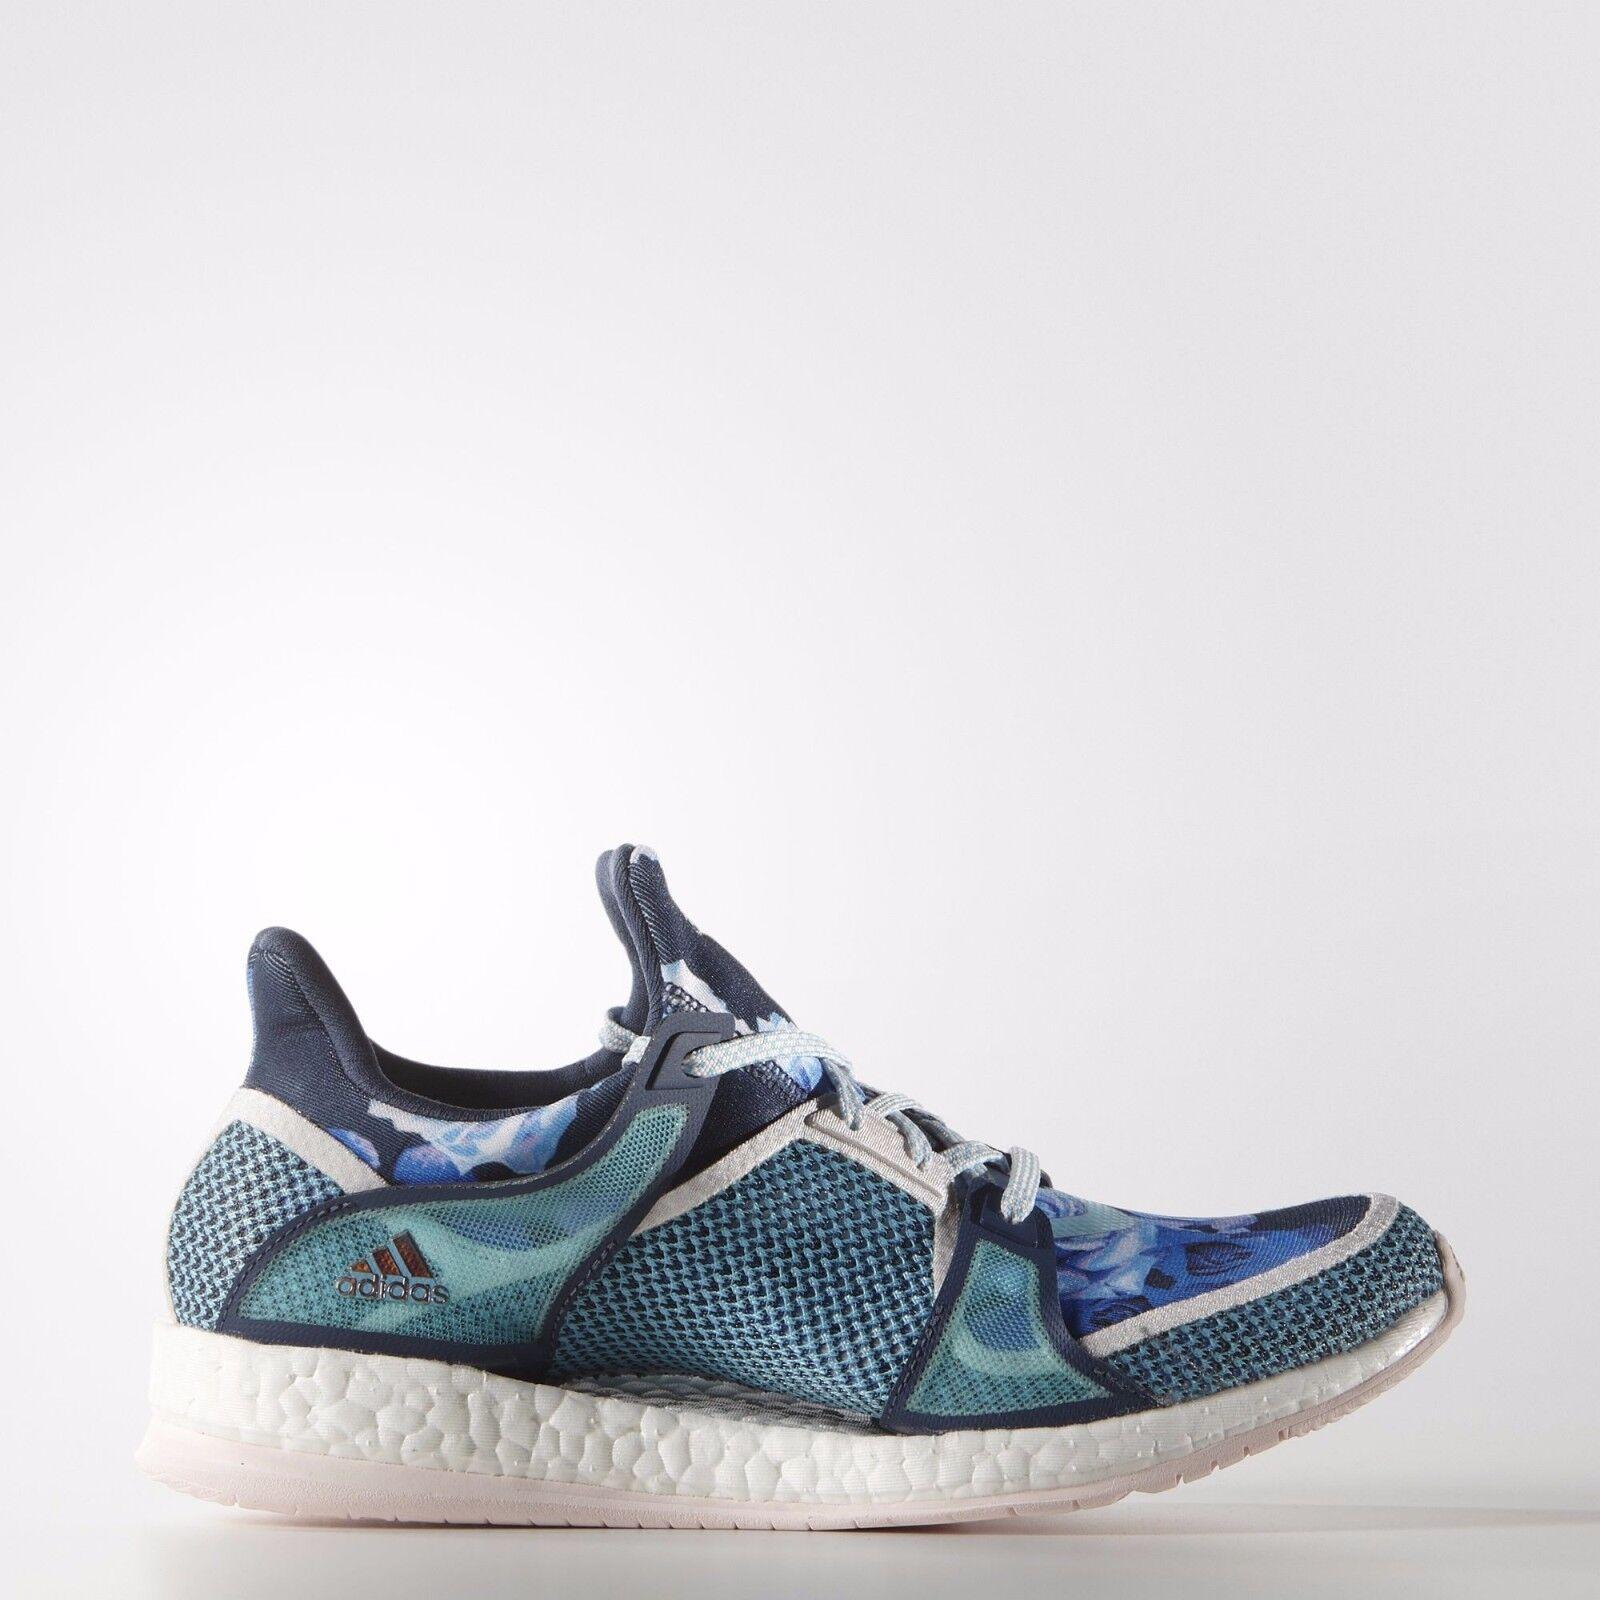 Adidas Pure Boost X Training AQ5329 Women's Running Limited Edition